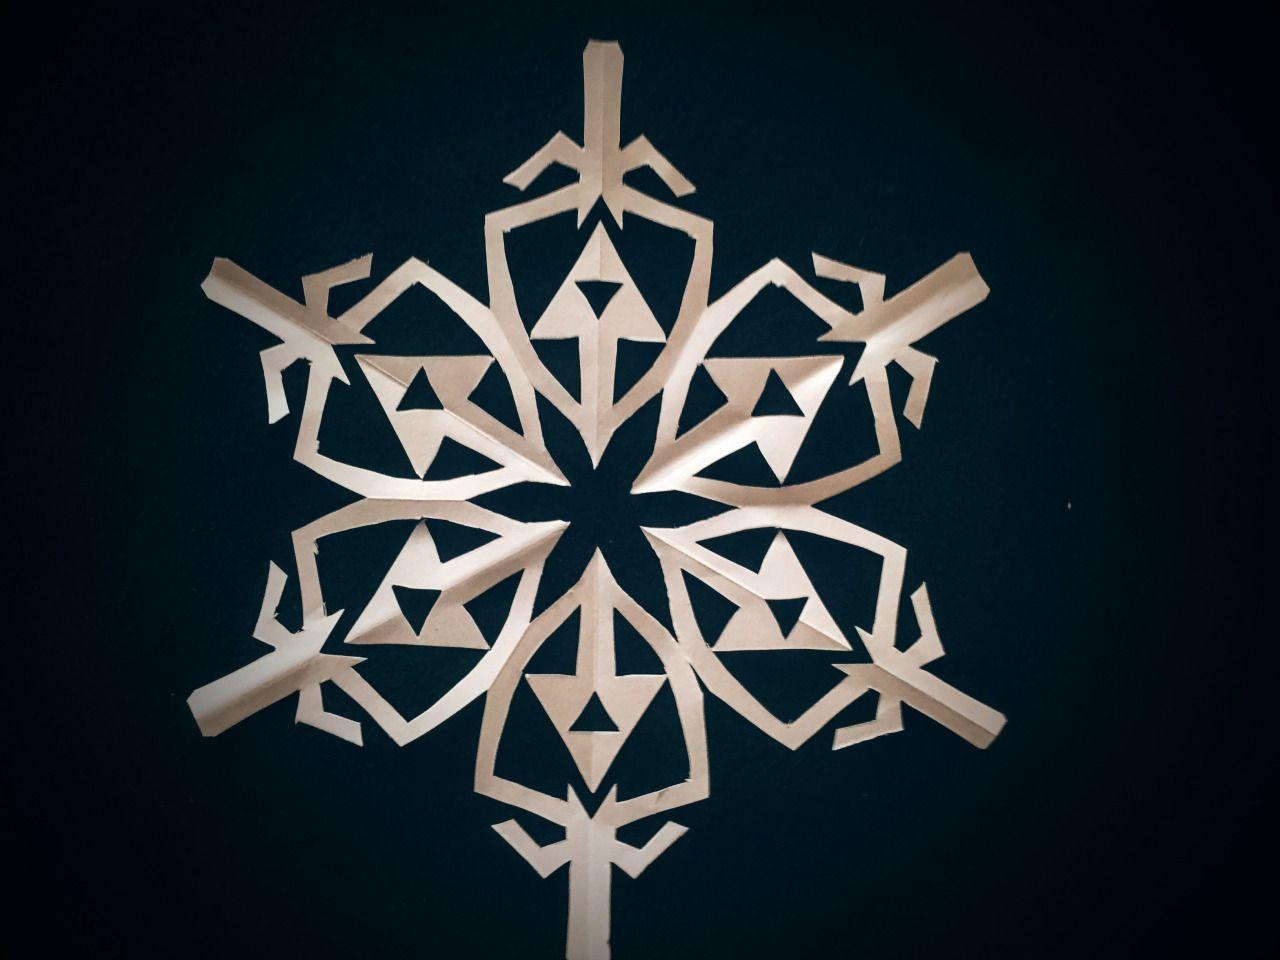 zelda snowflake template  Pin on Zelda